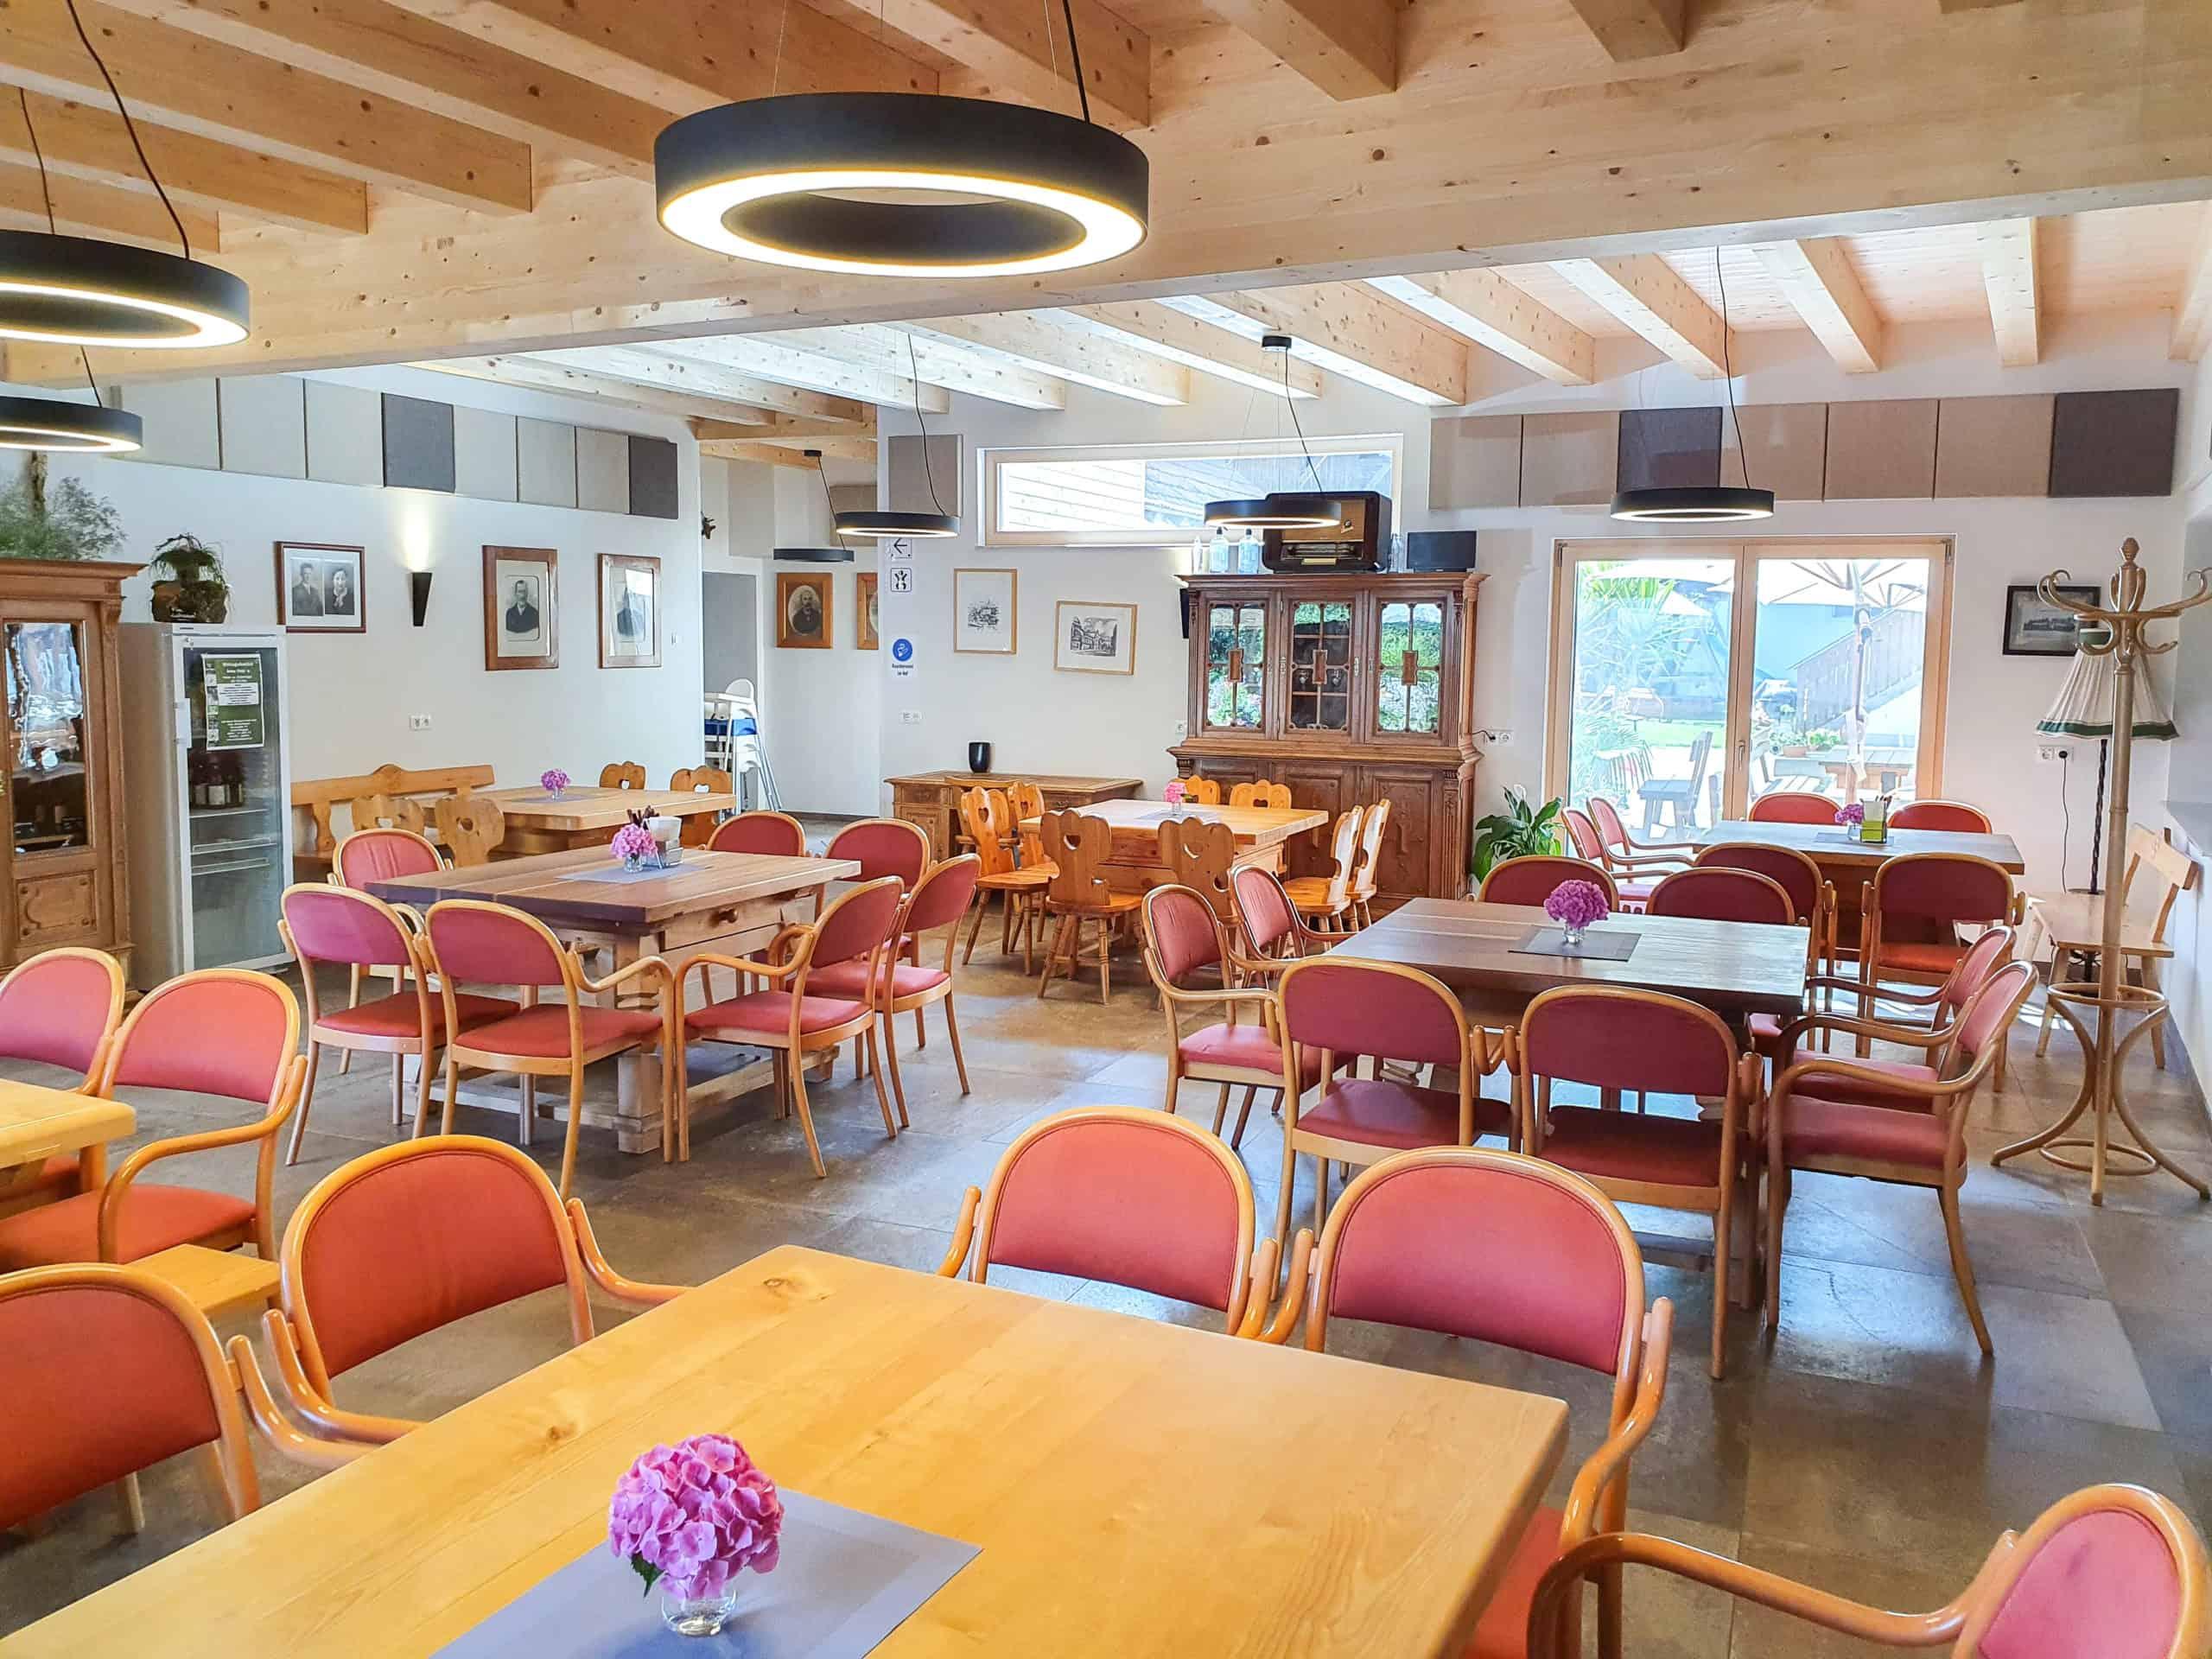 AKUSTIK Most Heuriger Wirtshaus Gasthaus